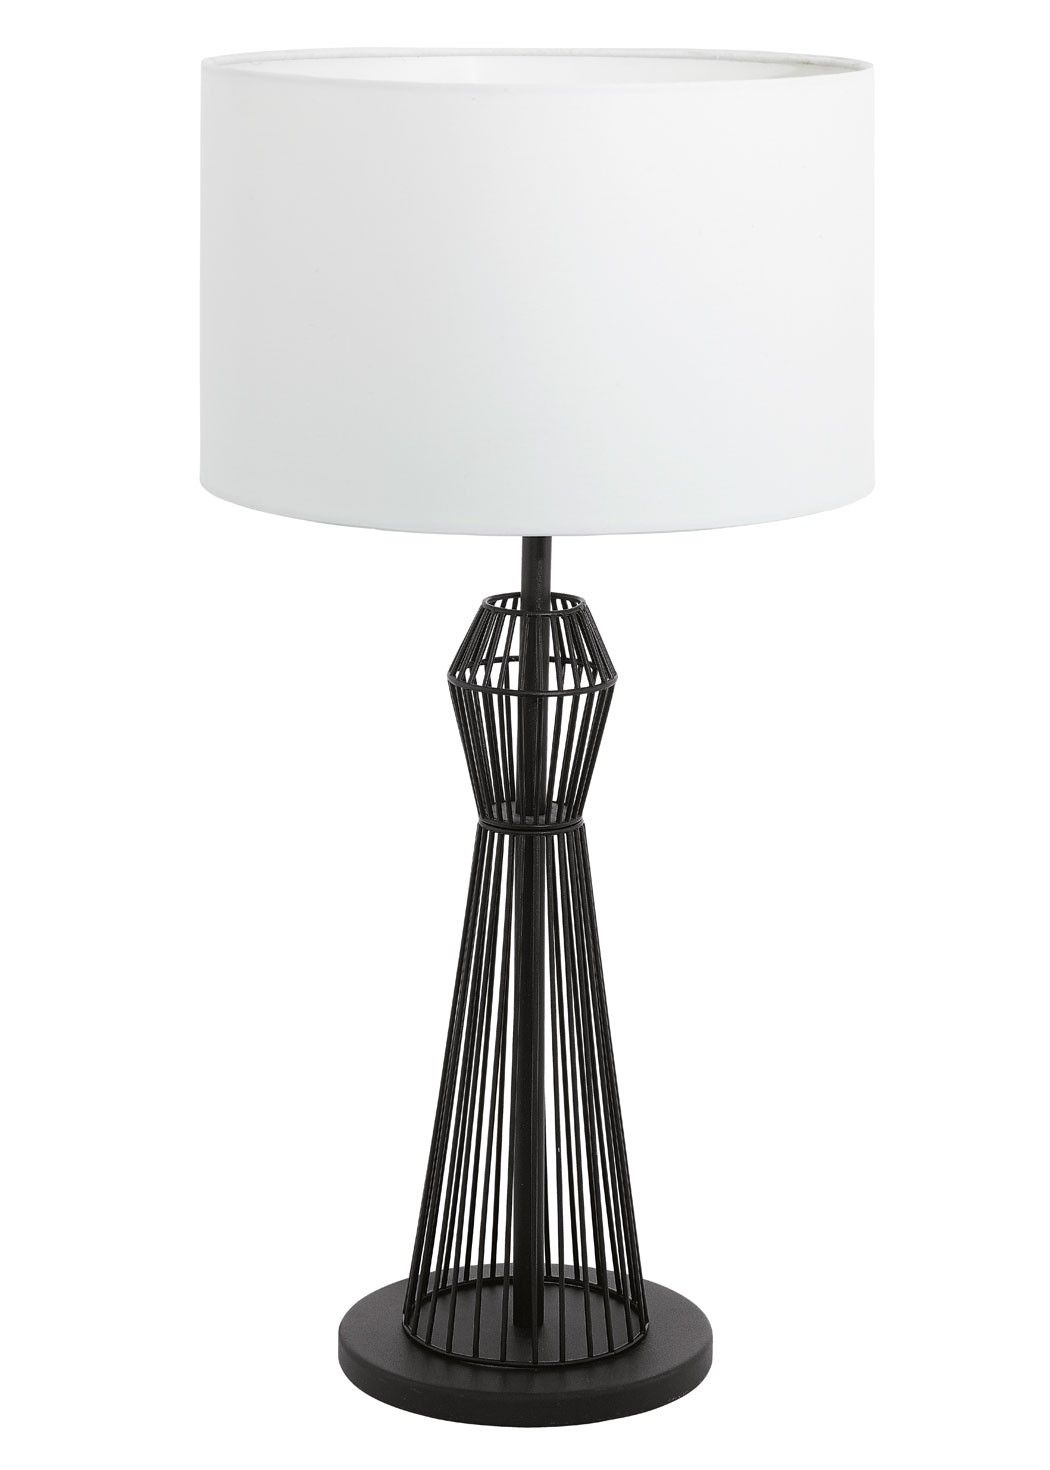 Eglo Valseno Table Lamp Black Lamp Table Lamp Black Table Lamps